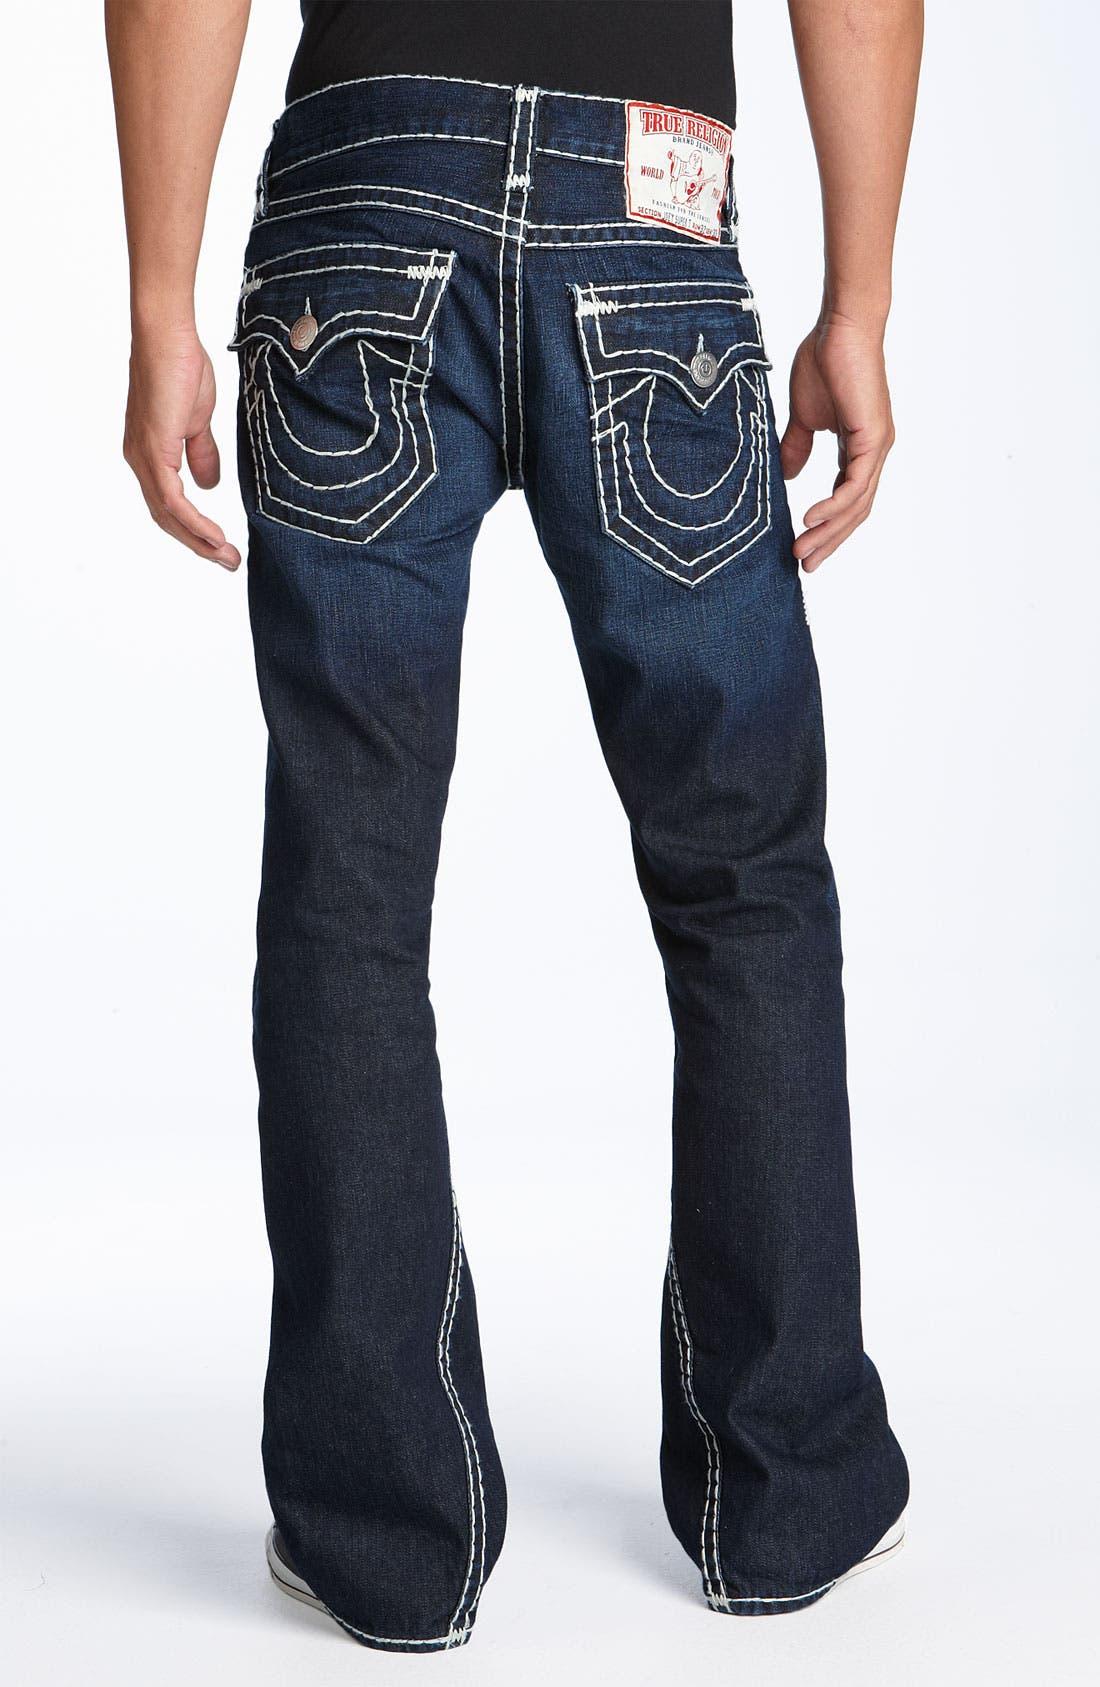 TRUE RELIGION BRAND JEANS,                             'Joey - Super T' Bootcut Jeans,                             Main thumbnail 1, color,                             400